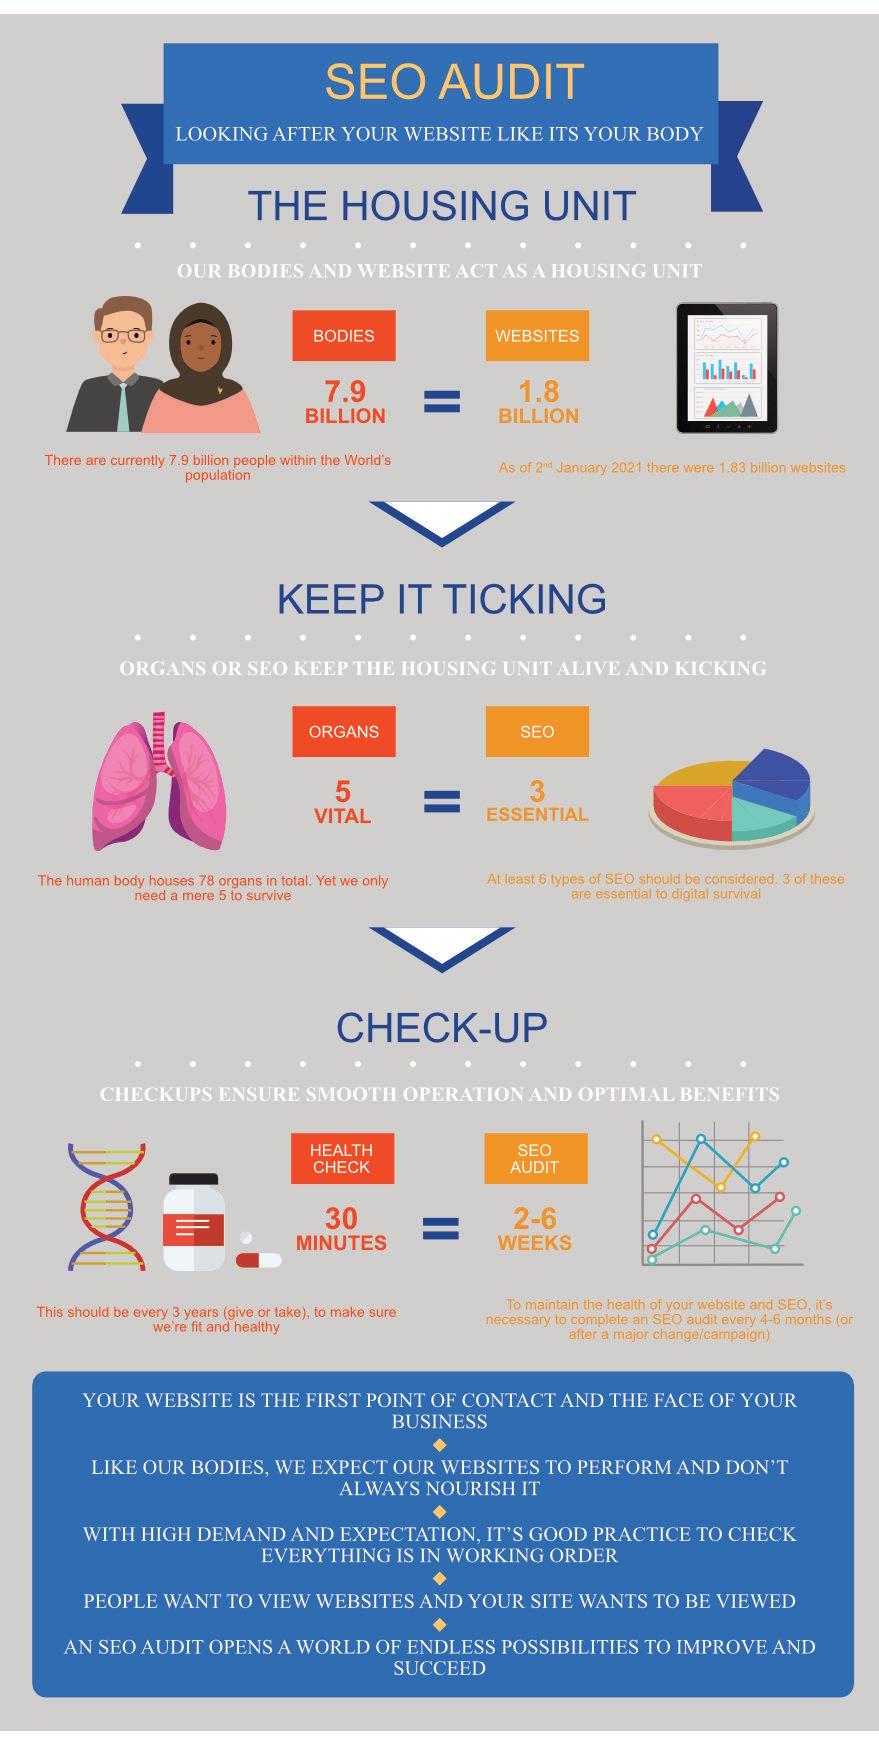 SEO-audit-infographic-like-body